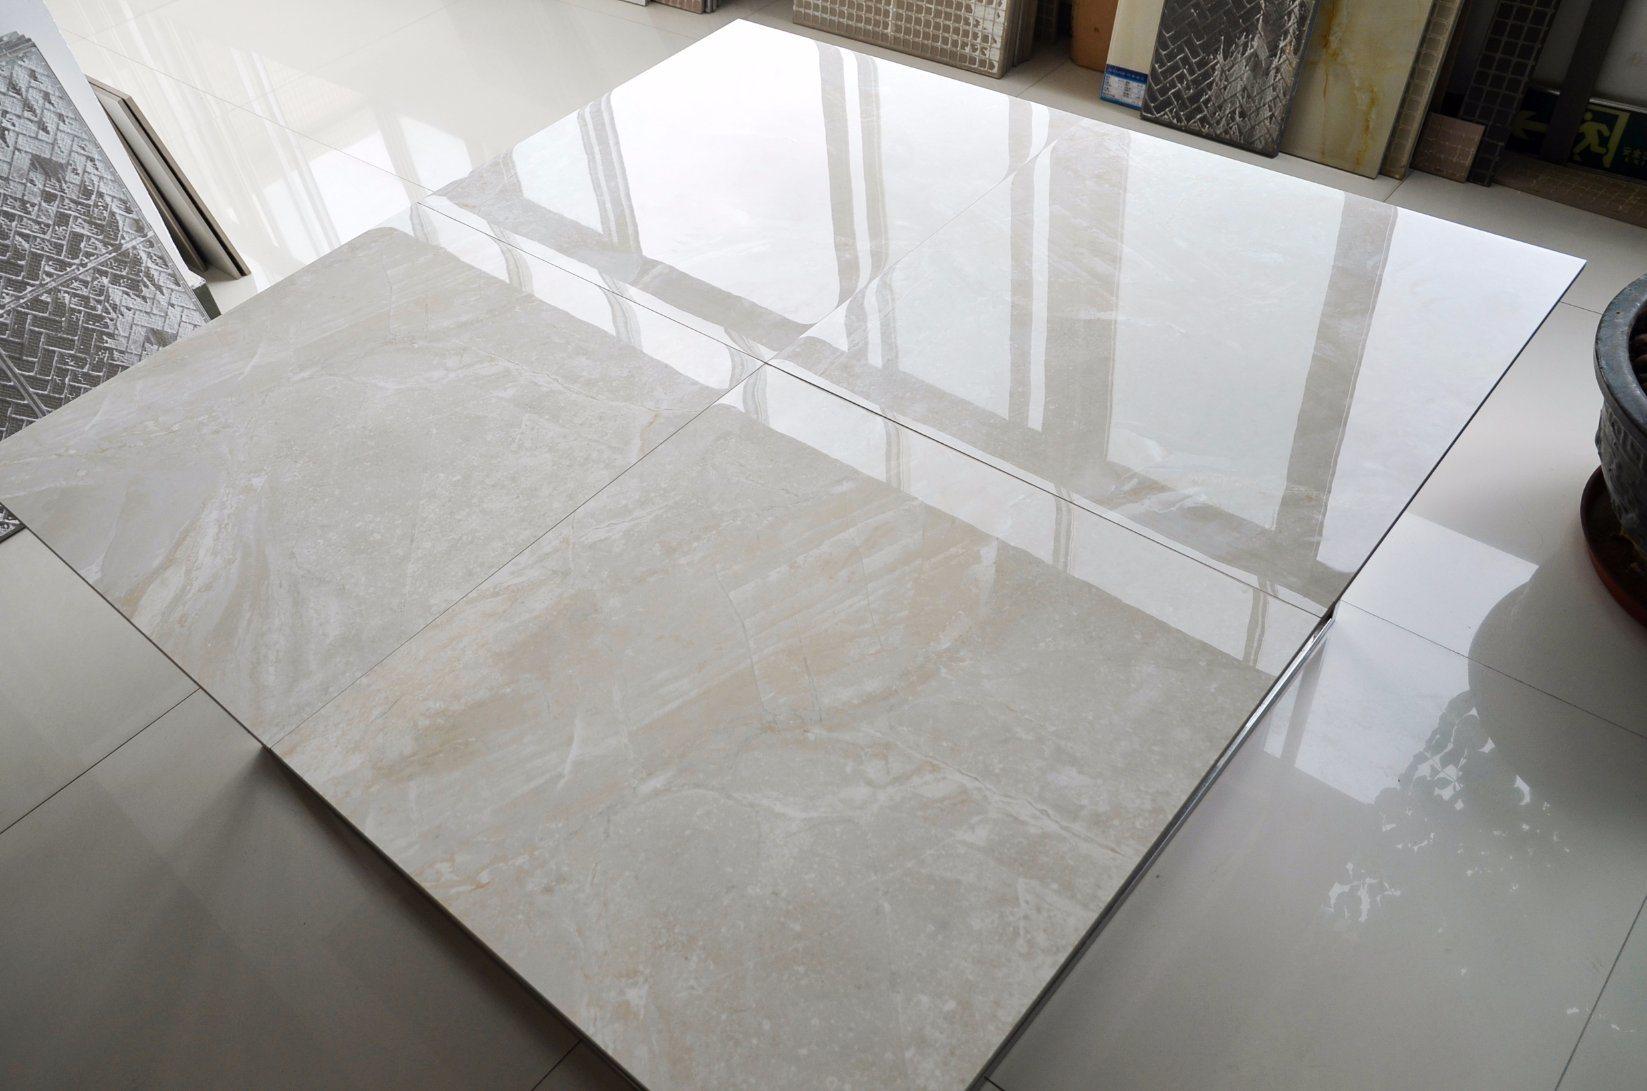 China Liquid Nano Technology Vitrified Floor Tiles Photos Pictures